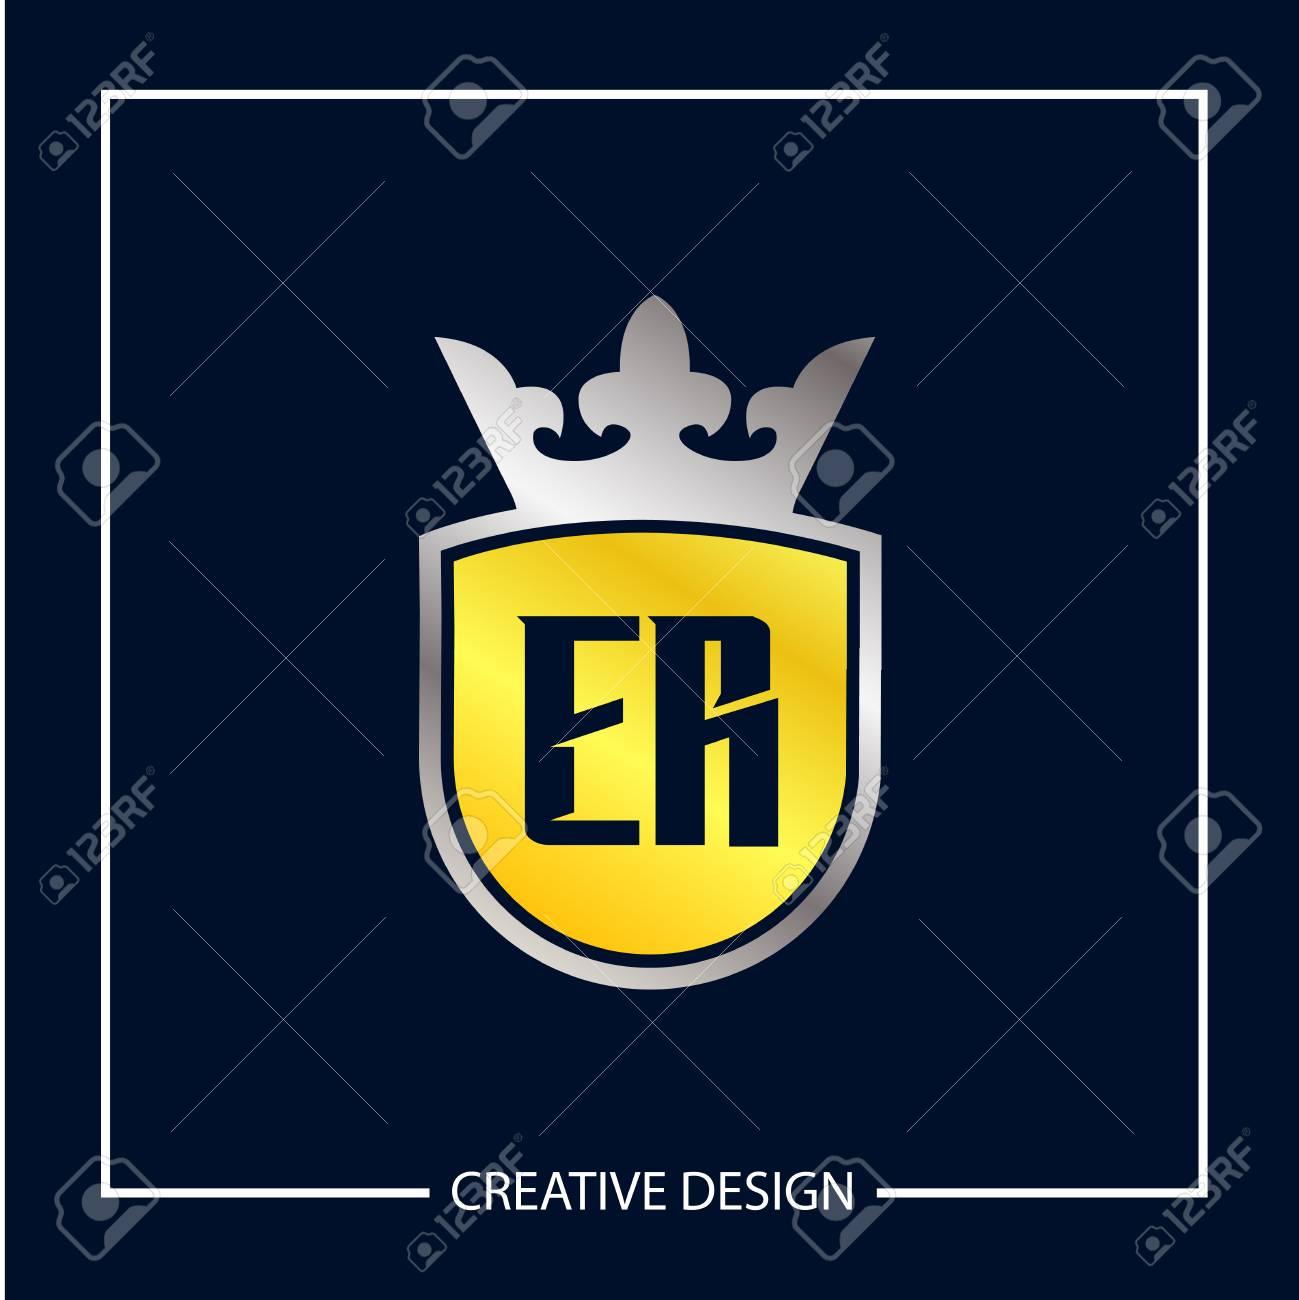 Initial Letter ER Template Design Vector Illustration - 119548934